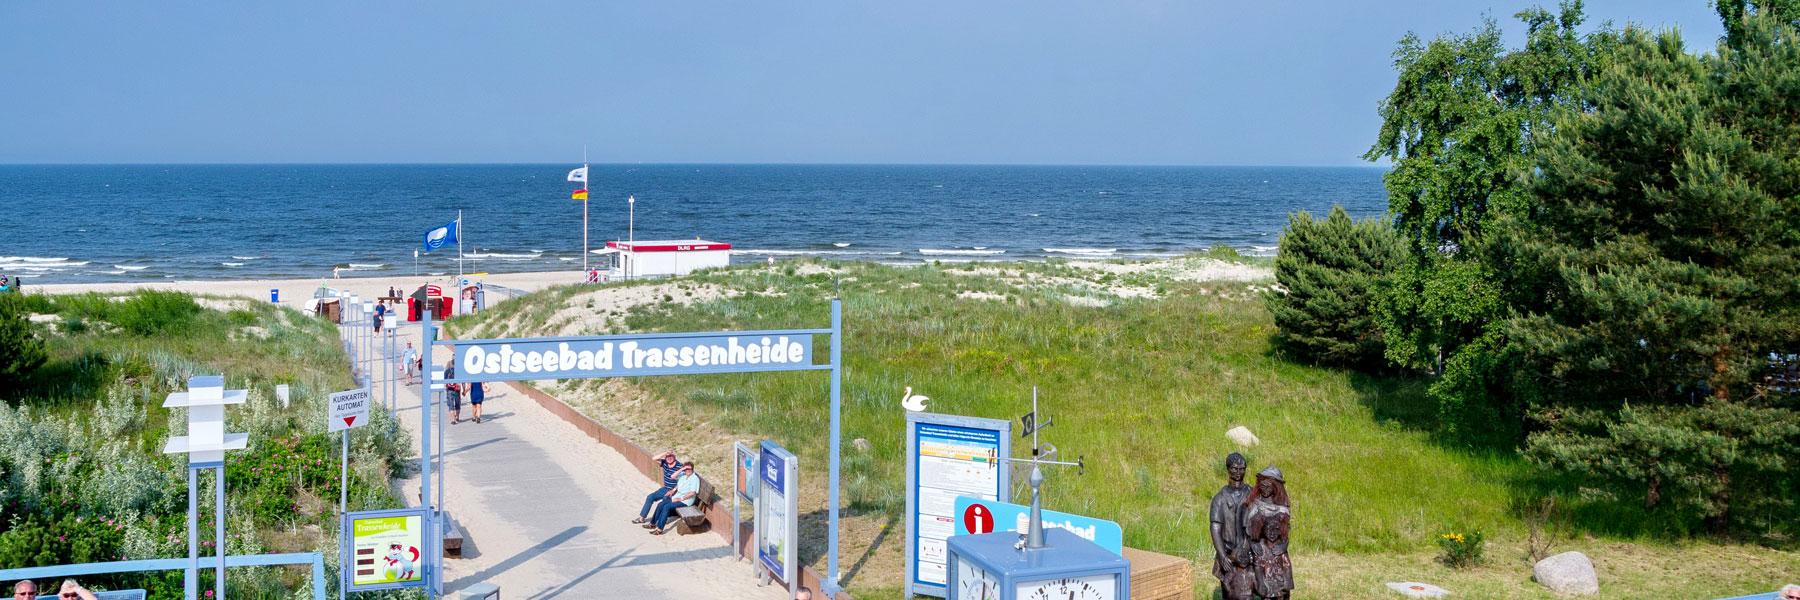 Ostseestrand - Pension Fischerhaus Trassenheide